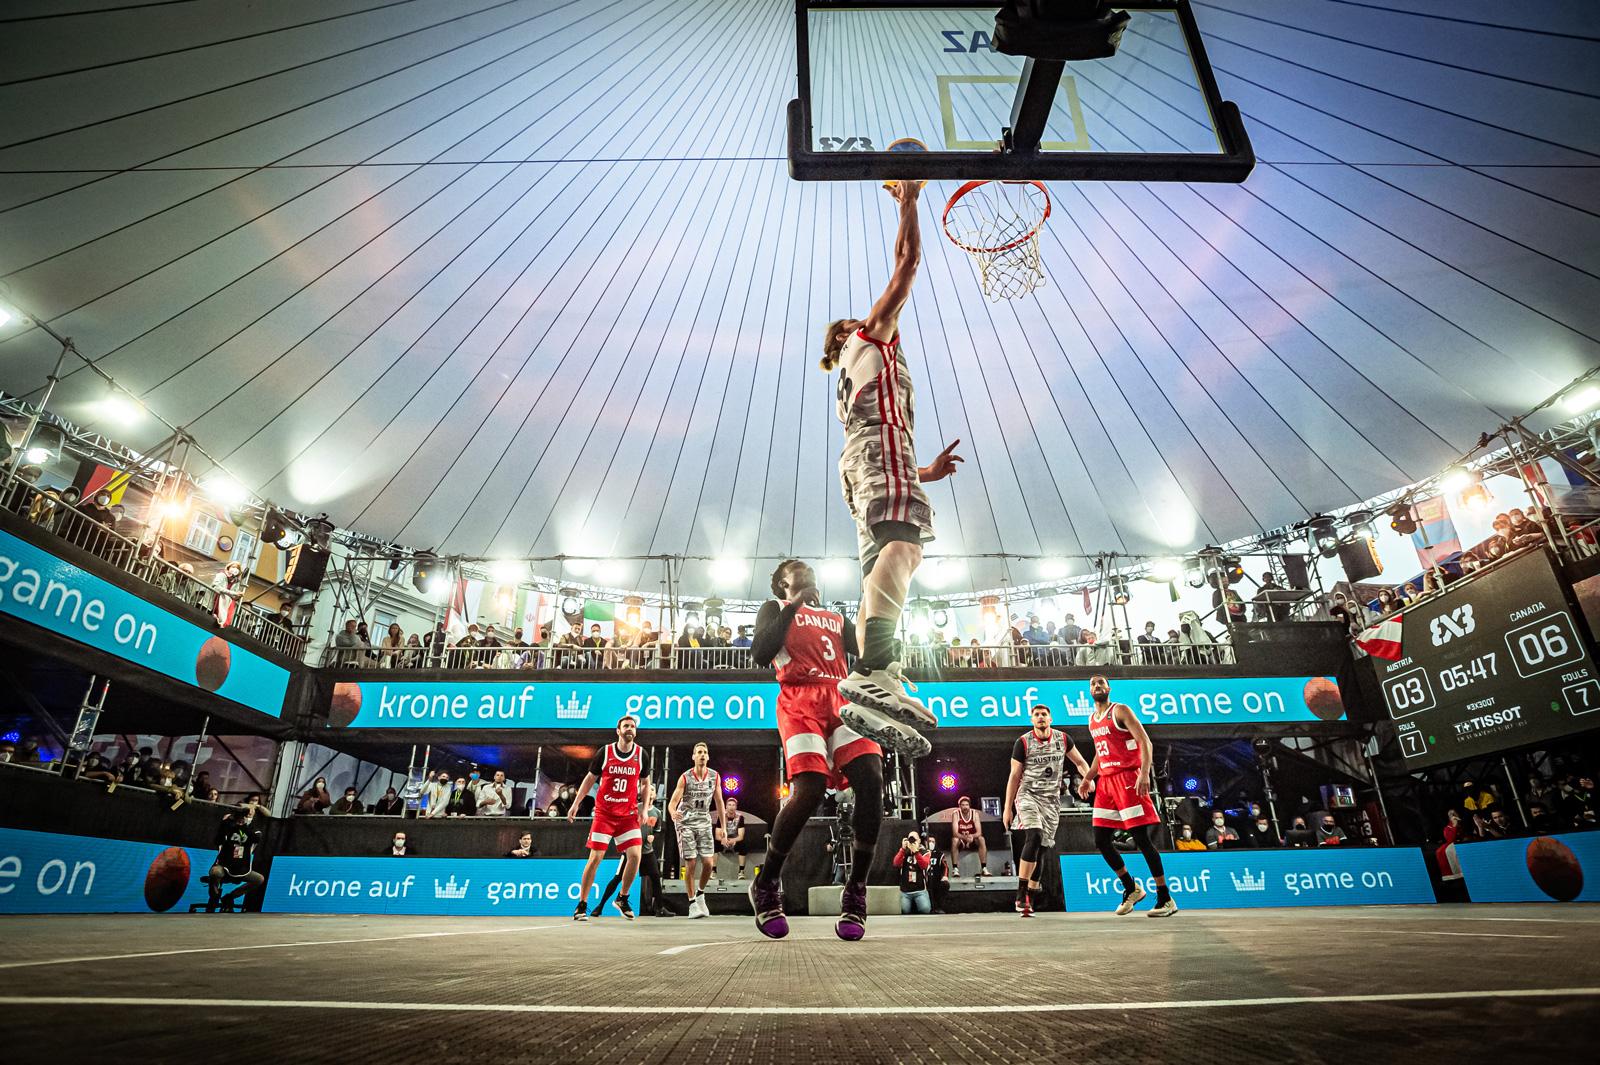 Fiba 3x3 OQT – Olympic Qualifier Tournament in Graz